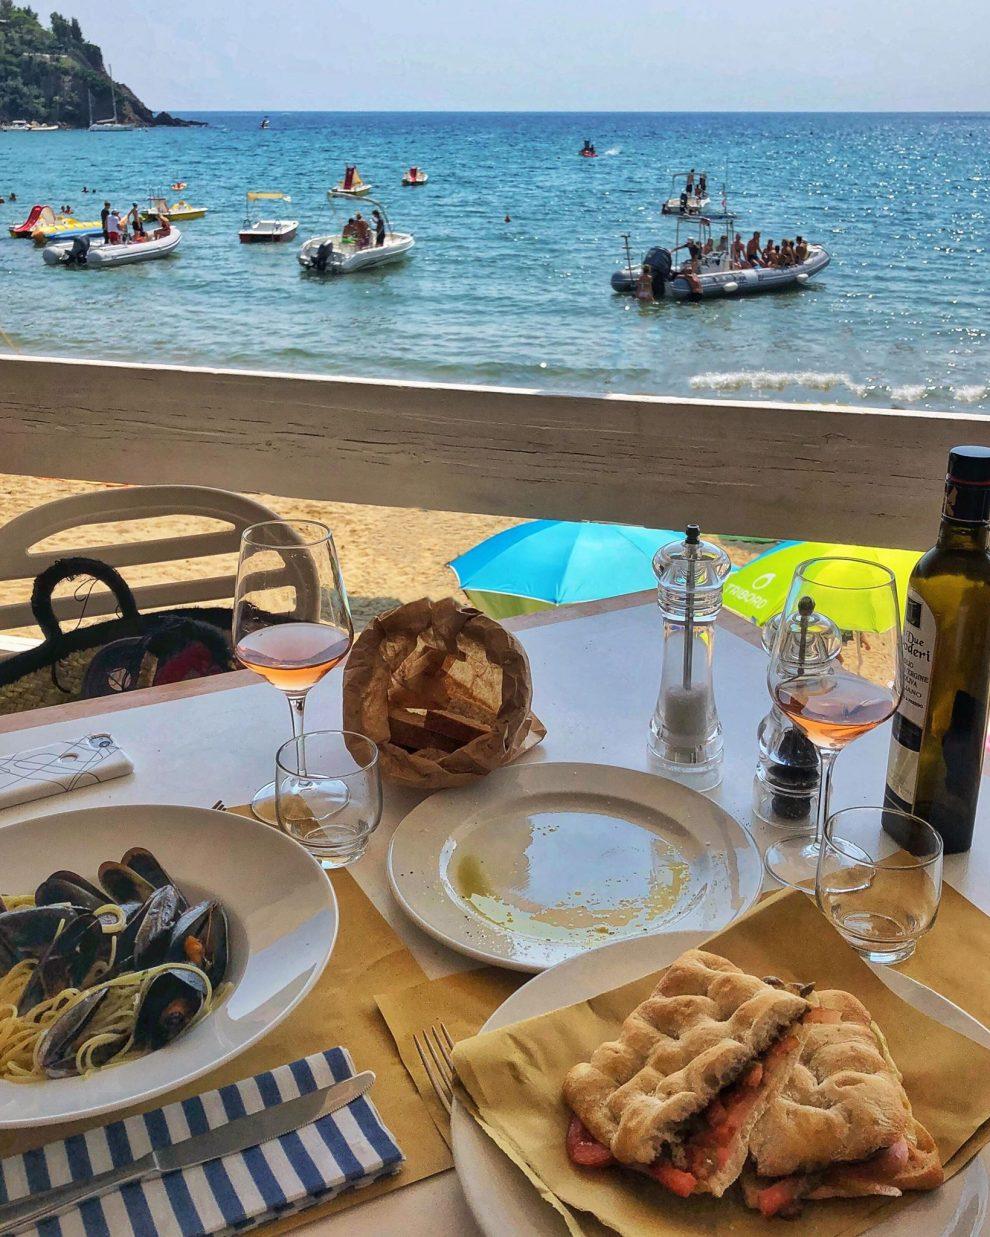 Lacona beach, Elba, Italie. glamping op Elba, lunch bij Ristorante Aguglia